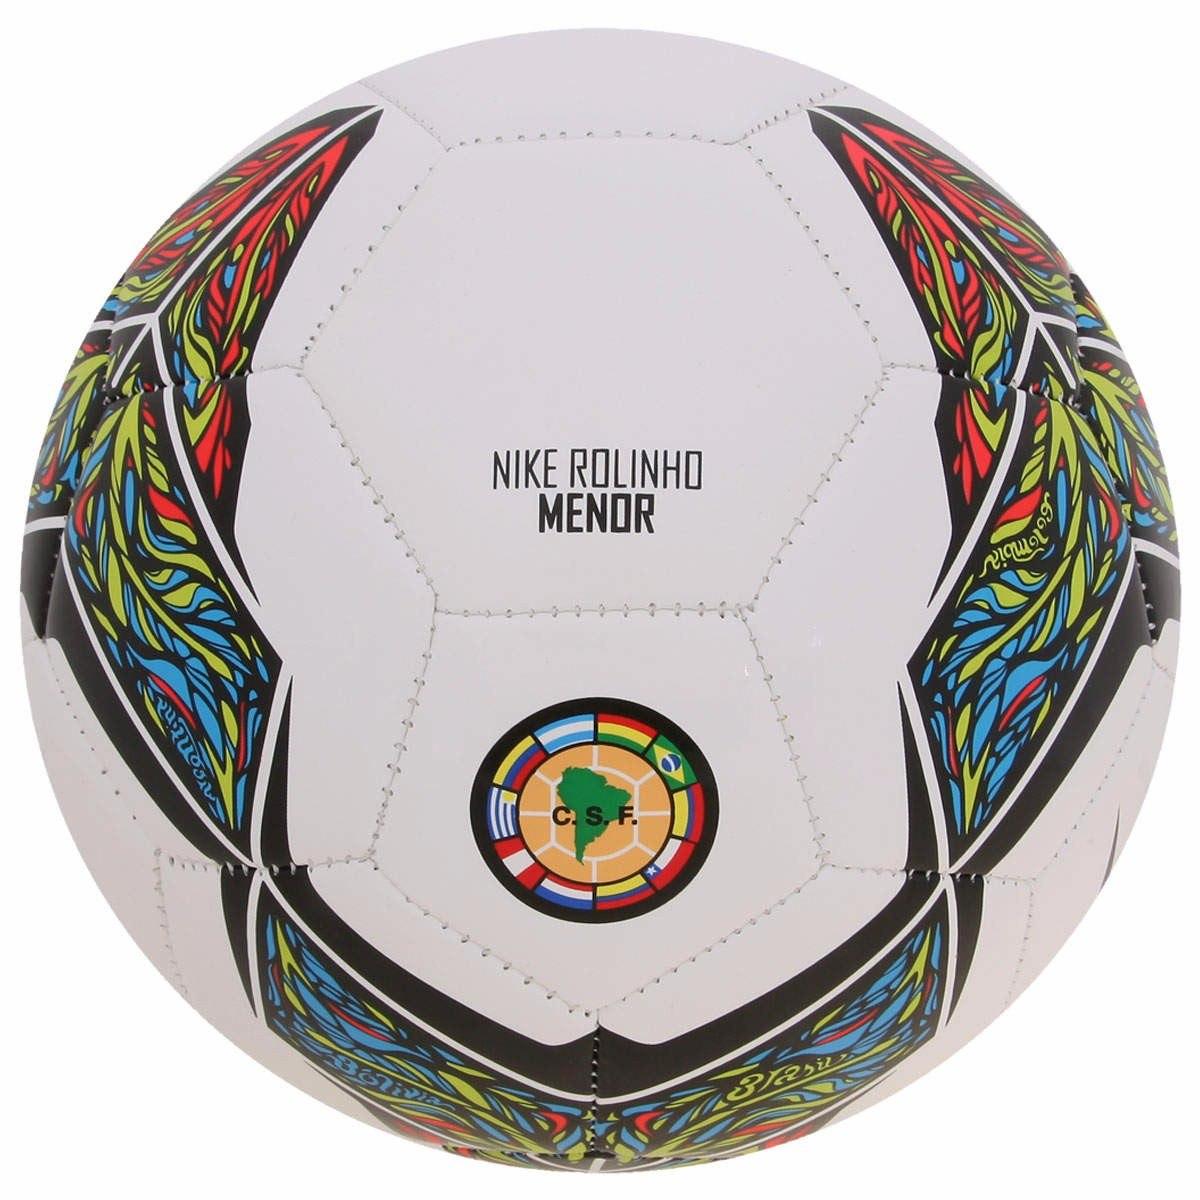 Bola De Futsal Nike Rolinho Menor Csf Pro Original 1magnus - R  79 ... def6d7ed0671f